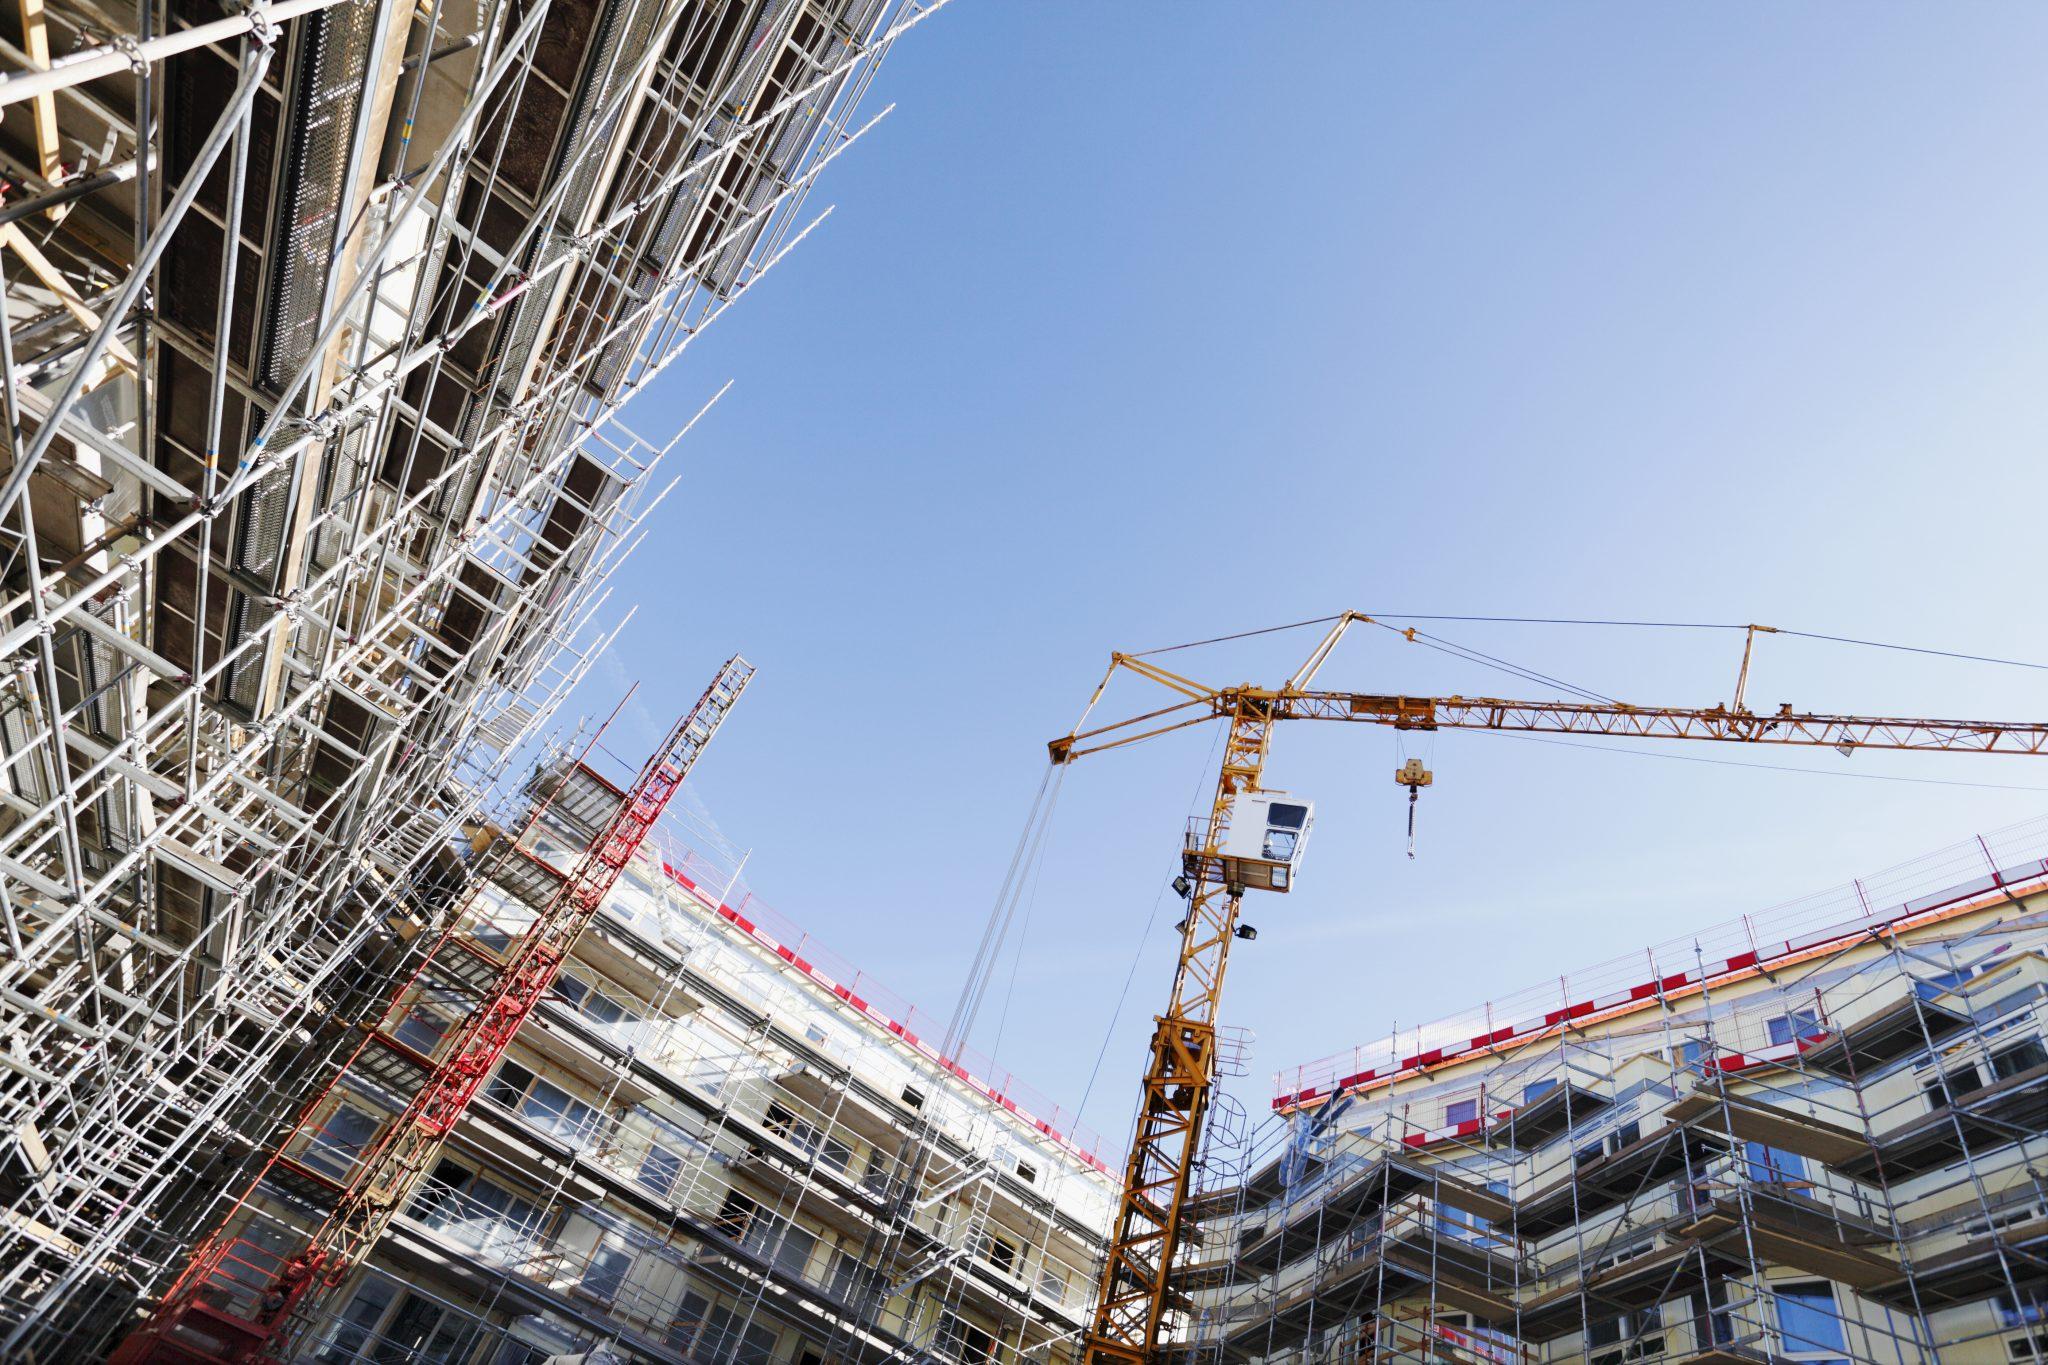 How Motorola Construction Radios Provide Communication on Work Sites